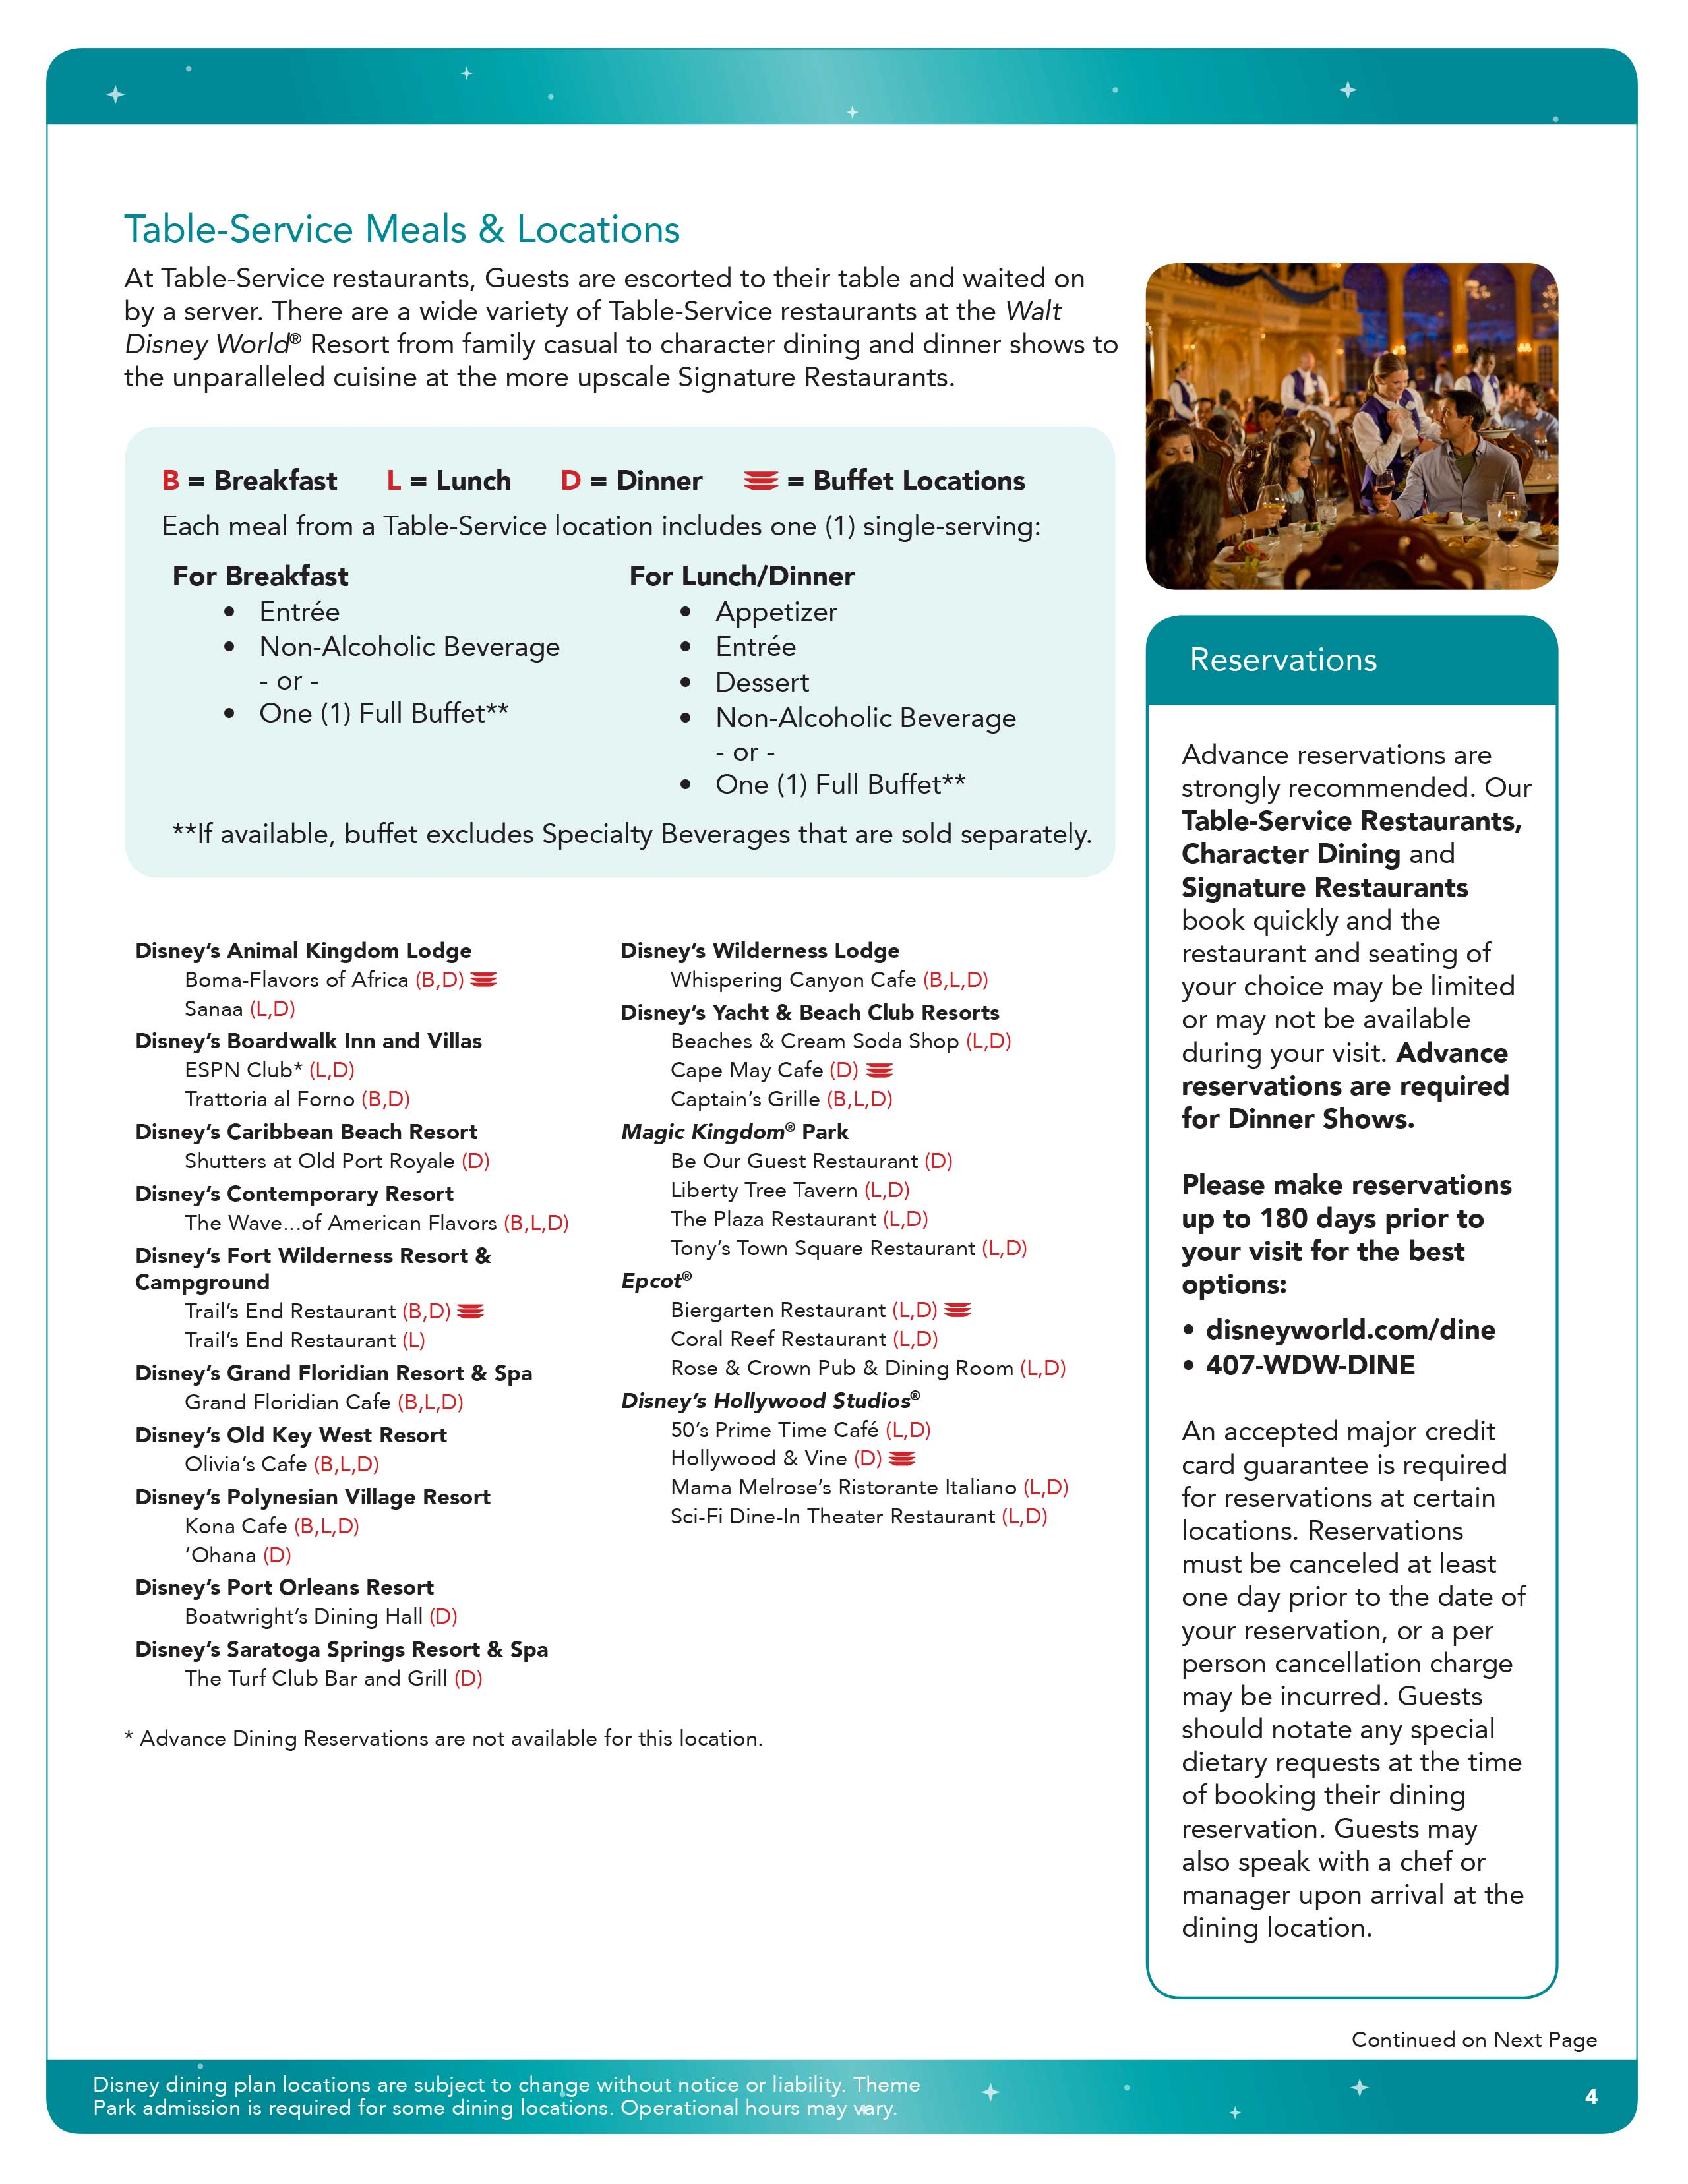 2016 Disney Dining Plan Brochures Photo 36 Of 41